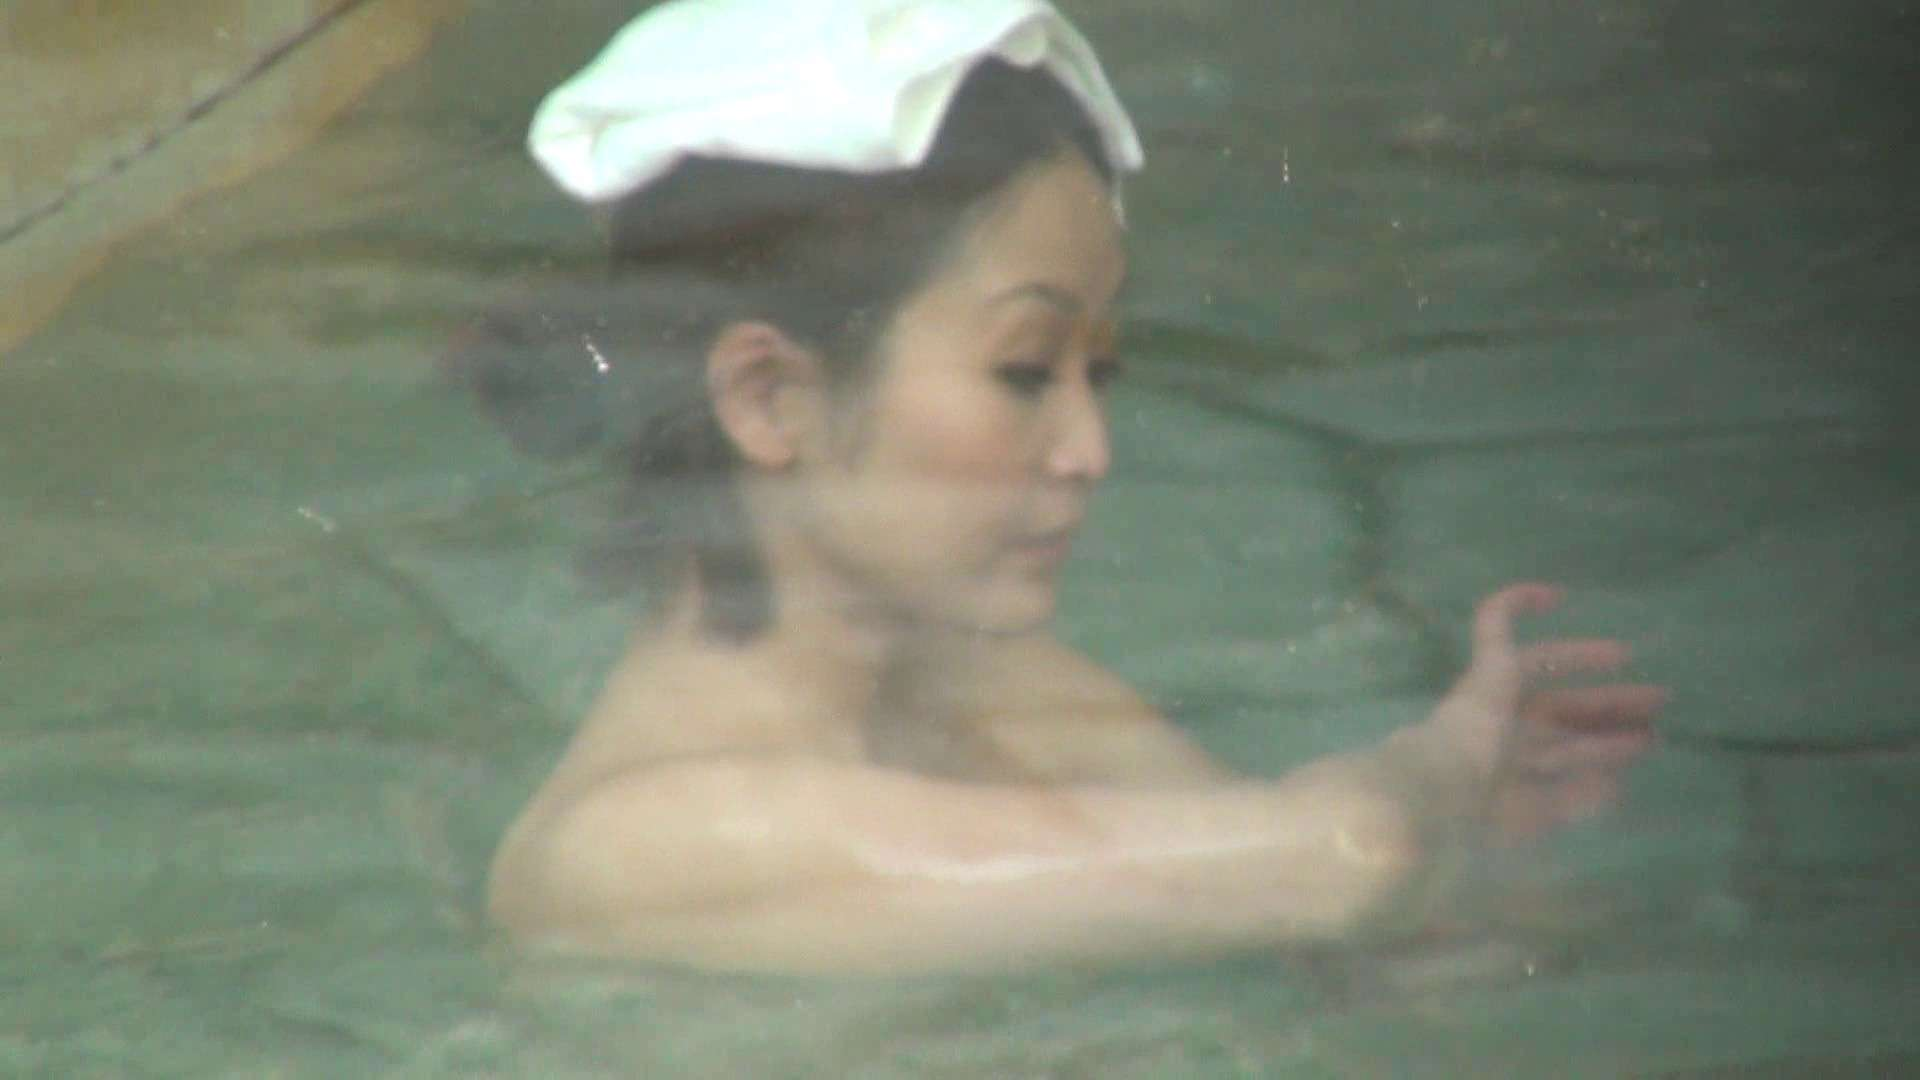 Aquaな露天風呂Vol.284 盗撮シリーズ | 露天風呂編  85PIX 3